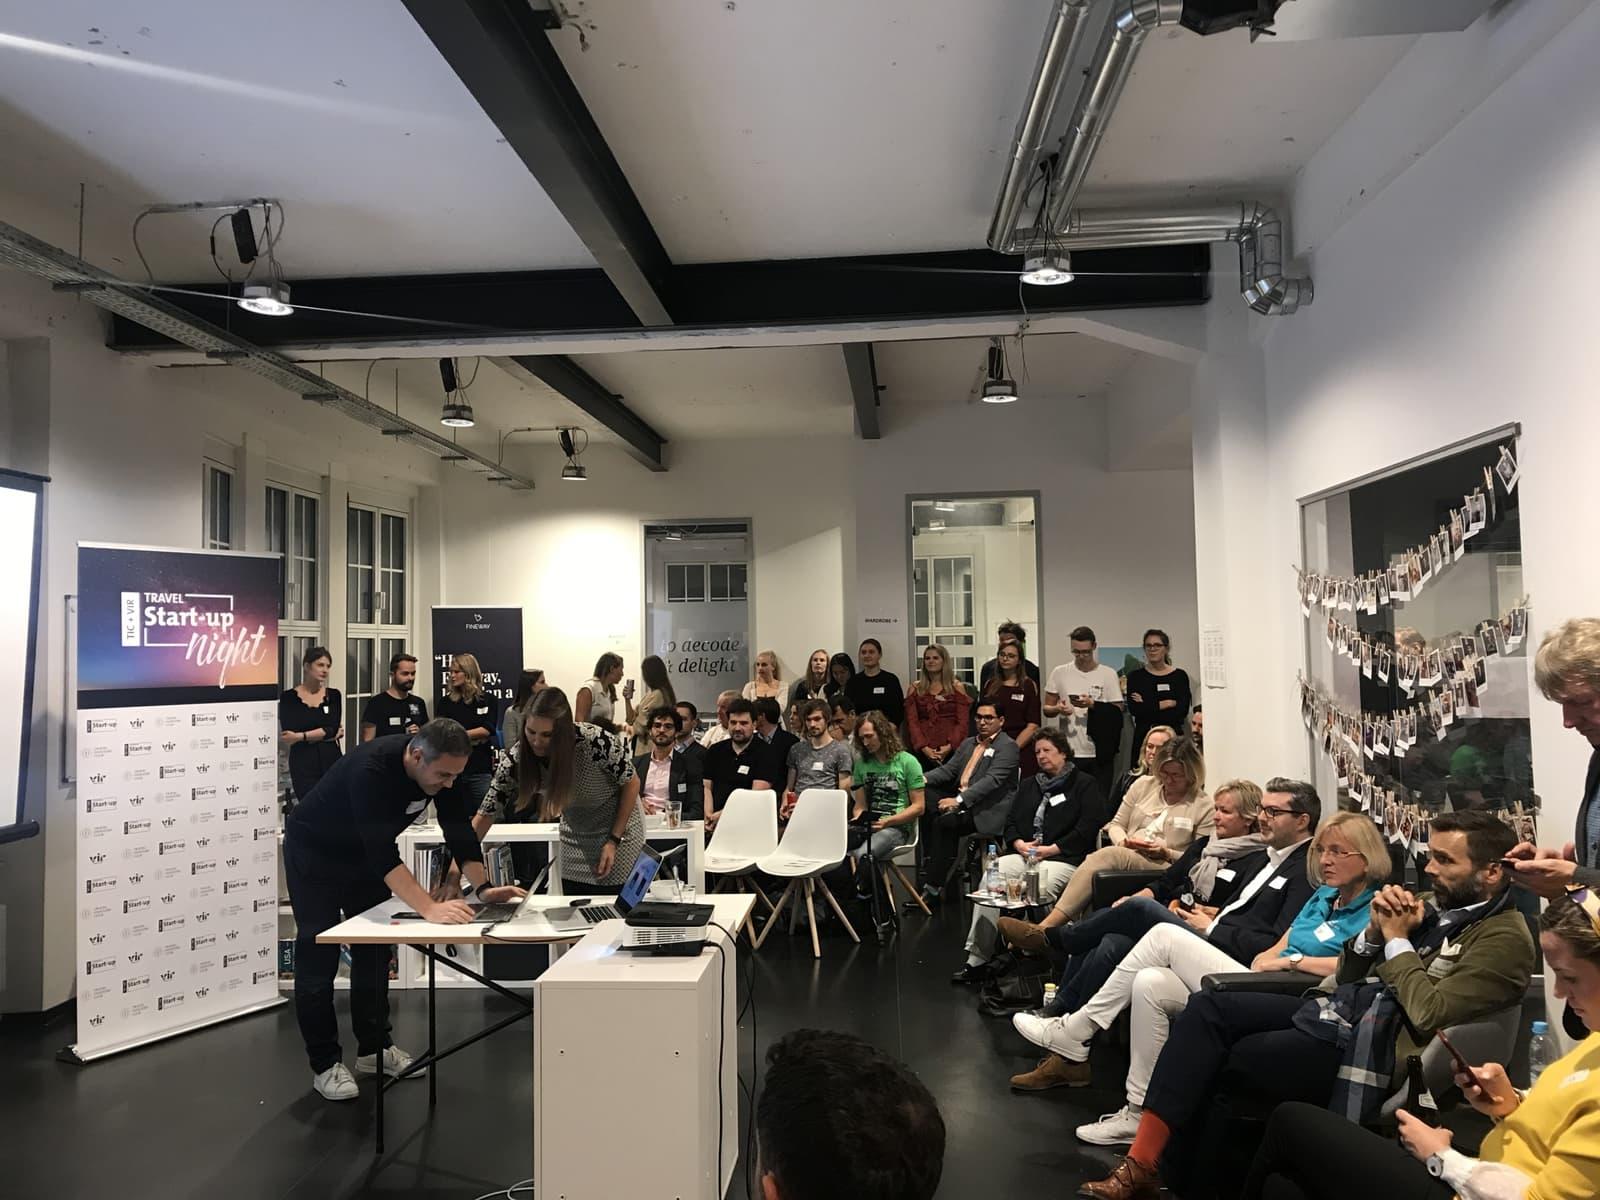 travel-startup-night-2020-stuttgart